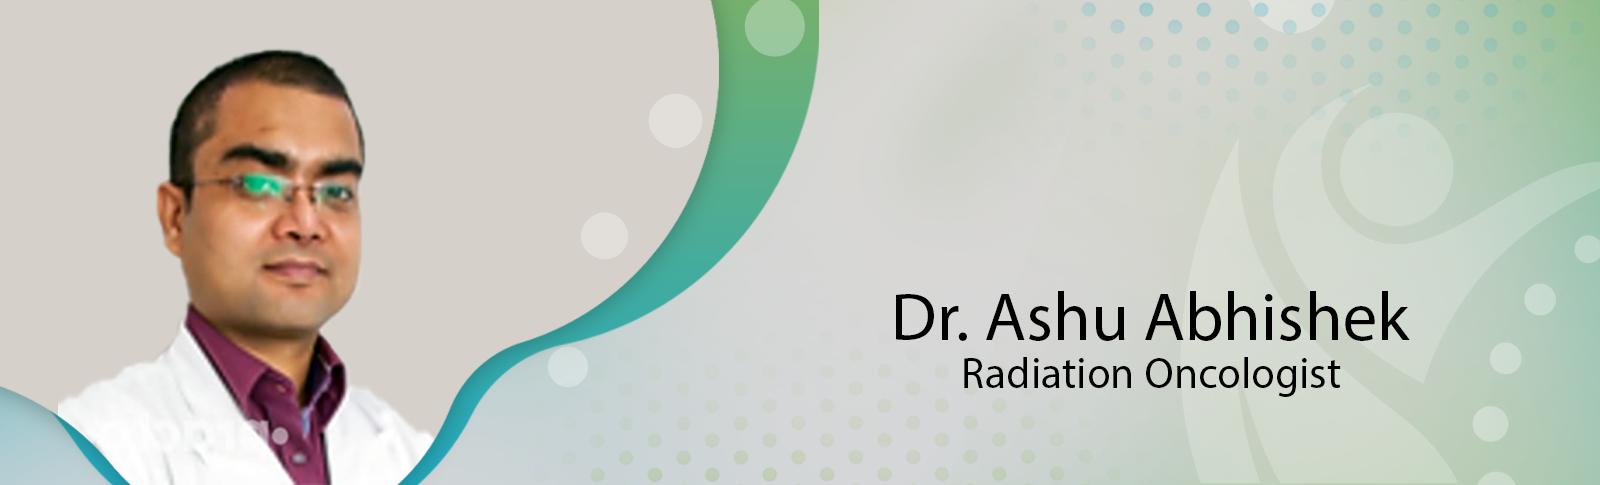 Dr. Ashu Abhisehk